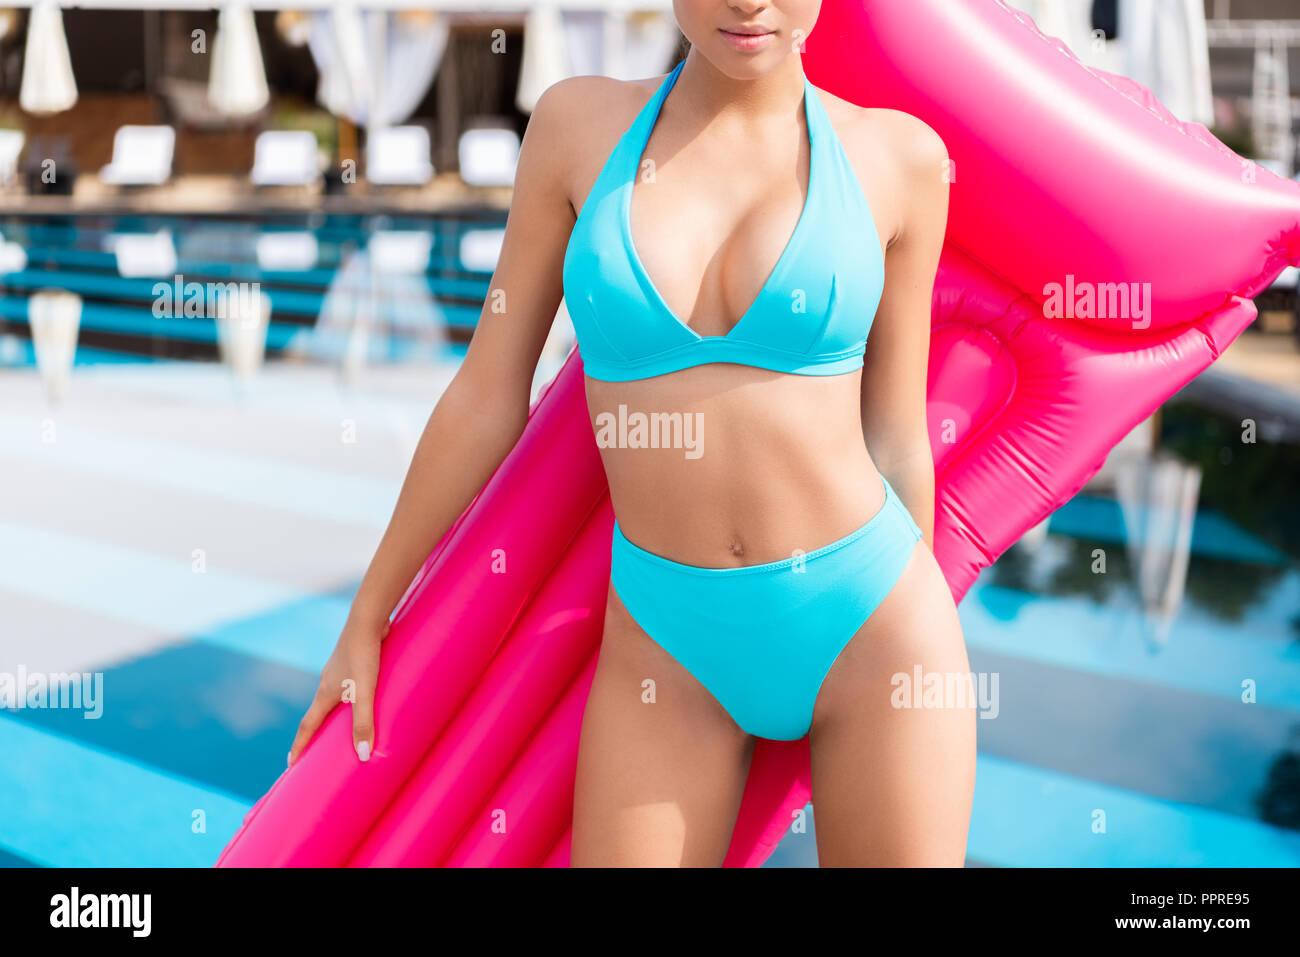 a4e9d0b3bb06 Pink Bikini Swimsuit Imágenes De Stock & Pink Bikini Swimsuit Fotos ...